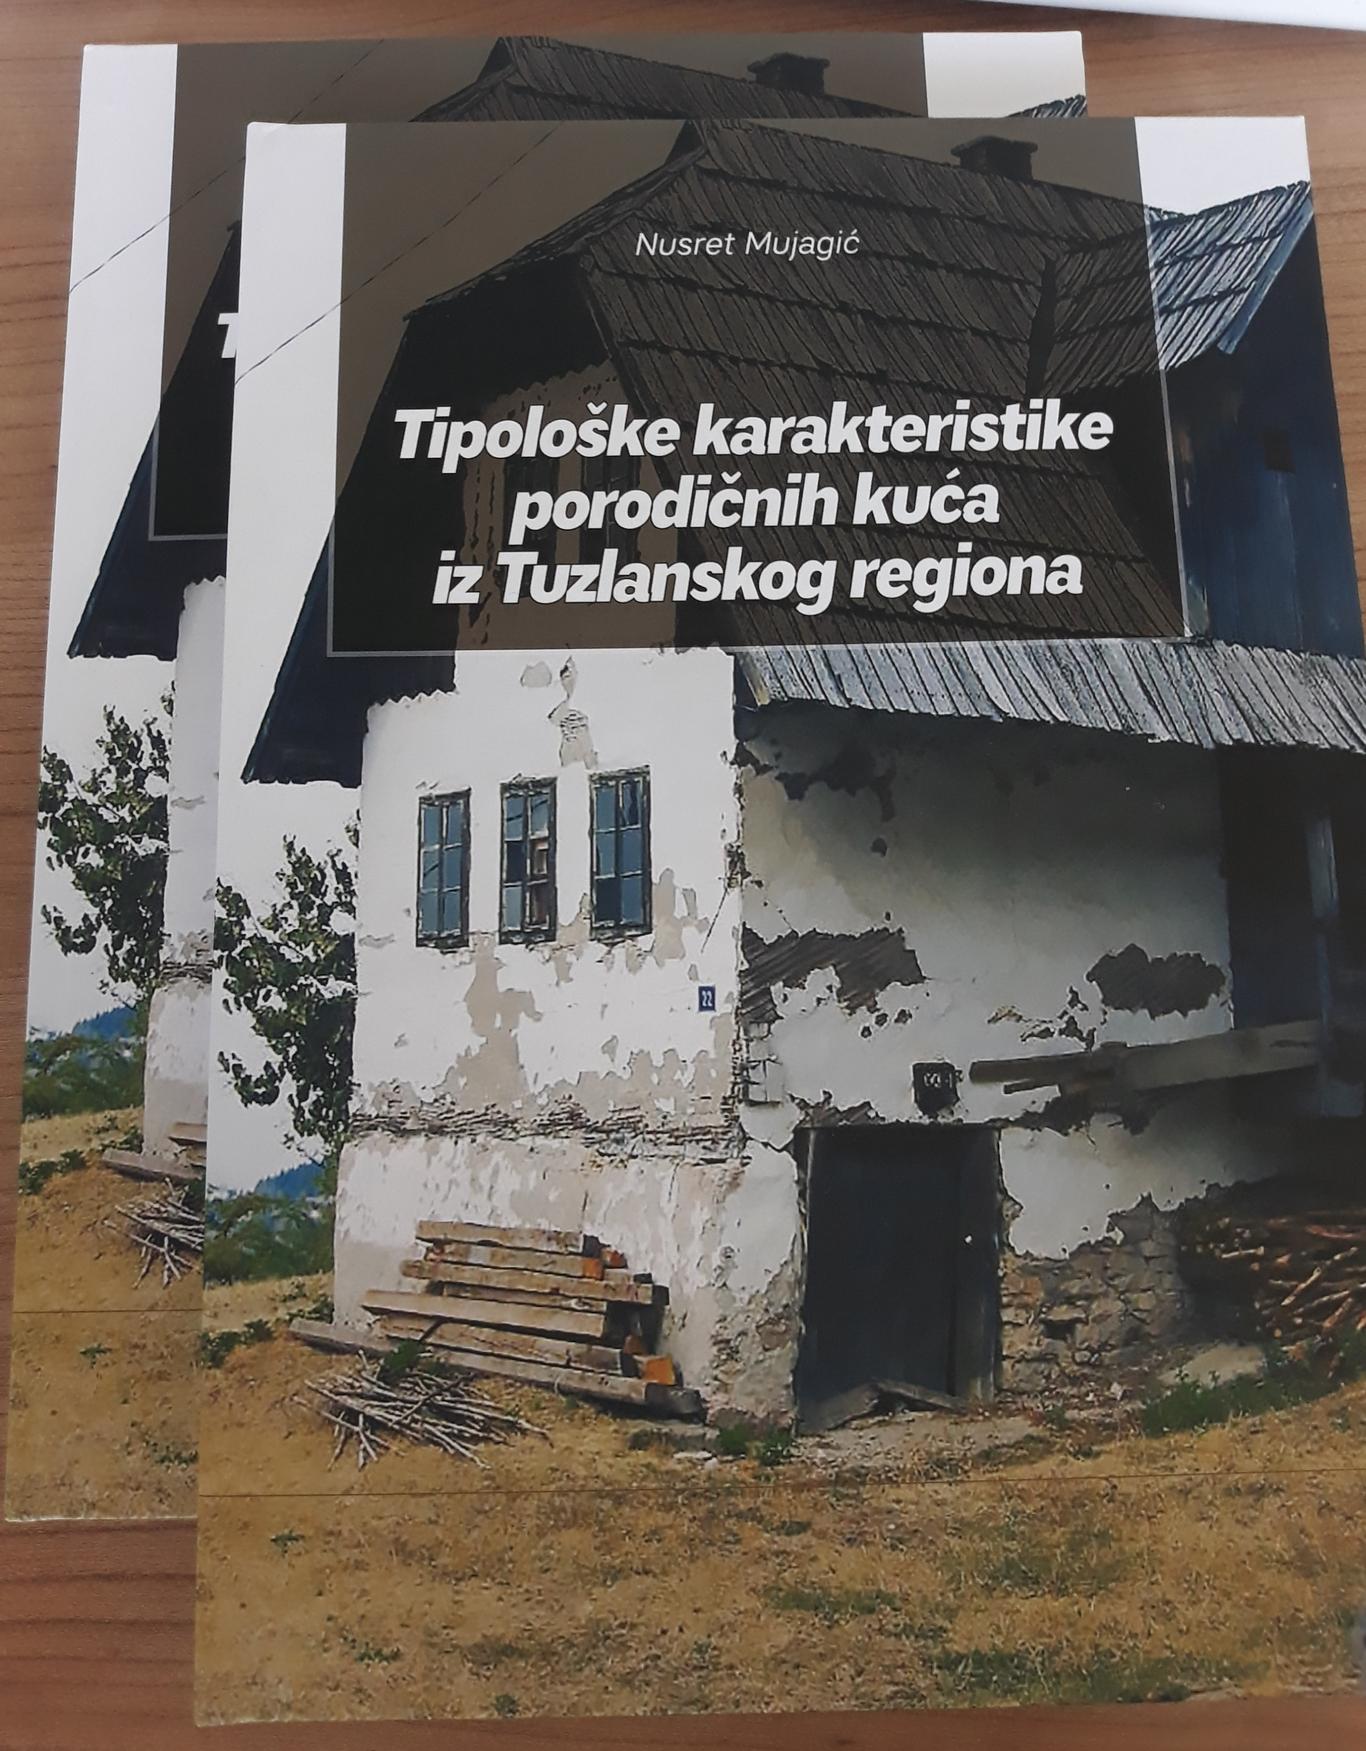 "Novo iz izdavaštva Zavoda: ""Tipološke karakteristike porodičnih kuća iz Tuzlanskog regiona"""